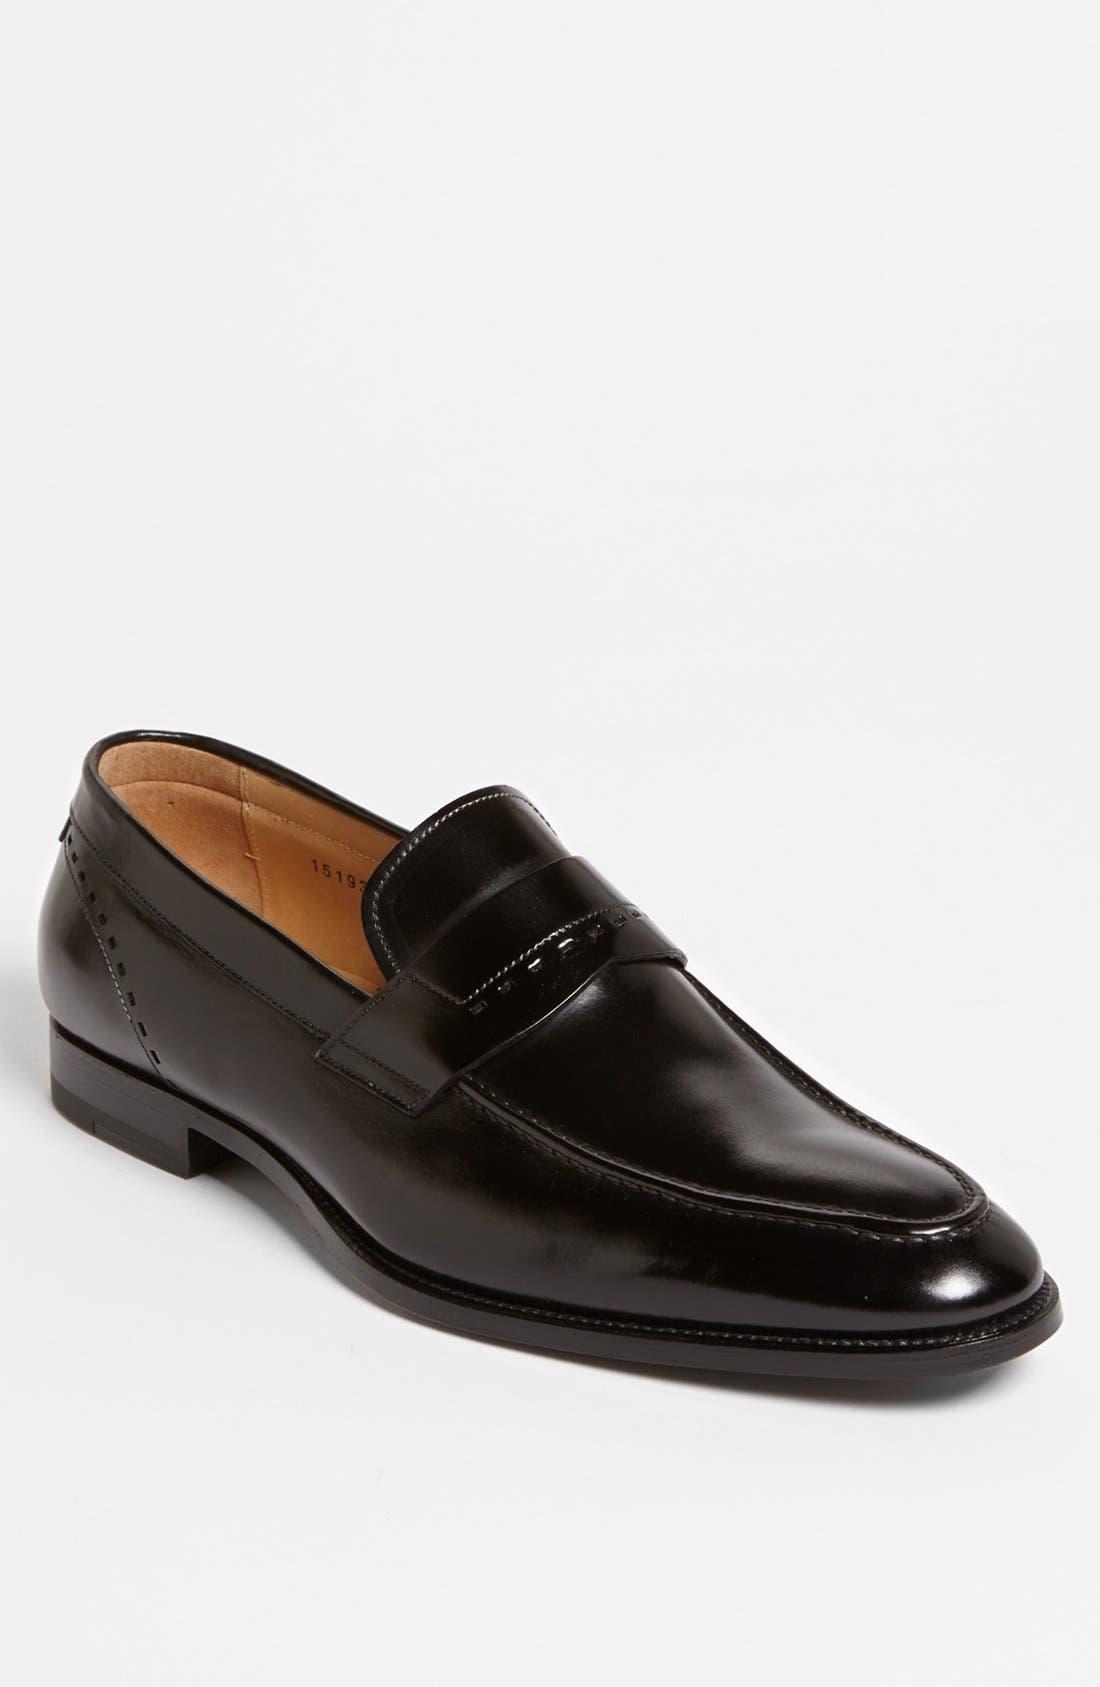 Main Image - Santoni 'Piermont' Loafer